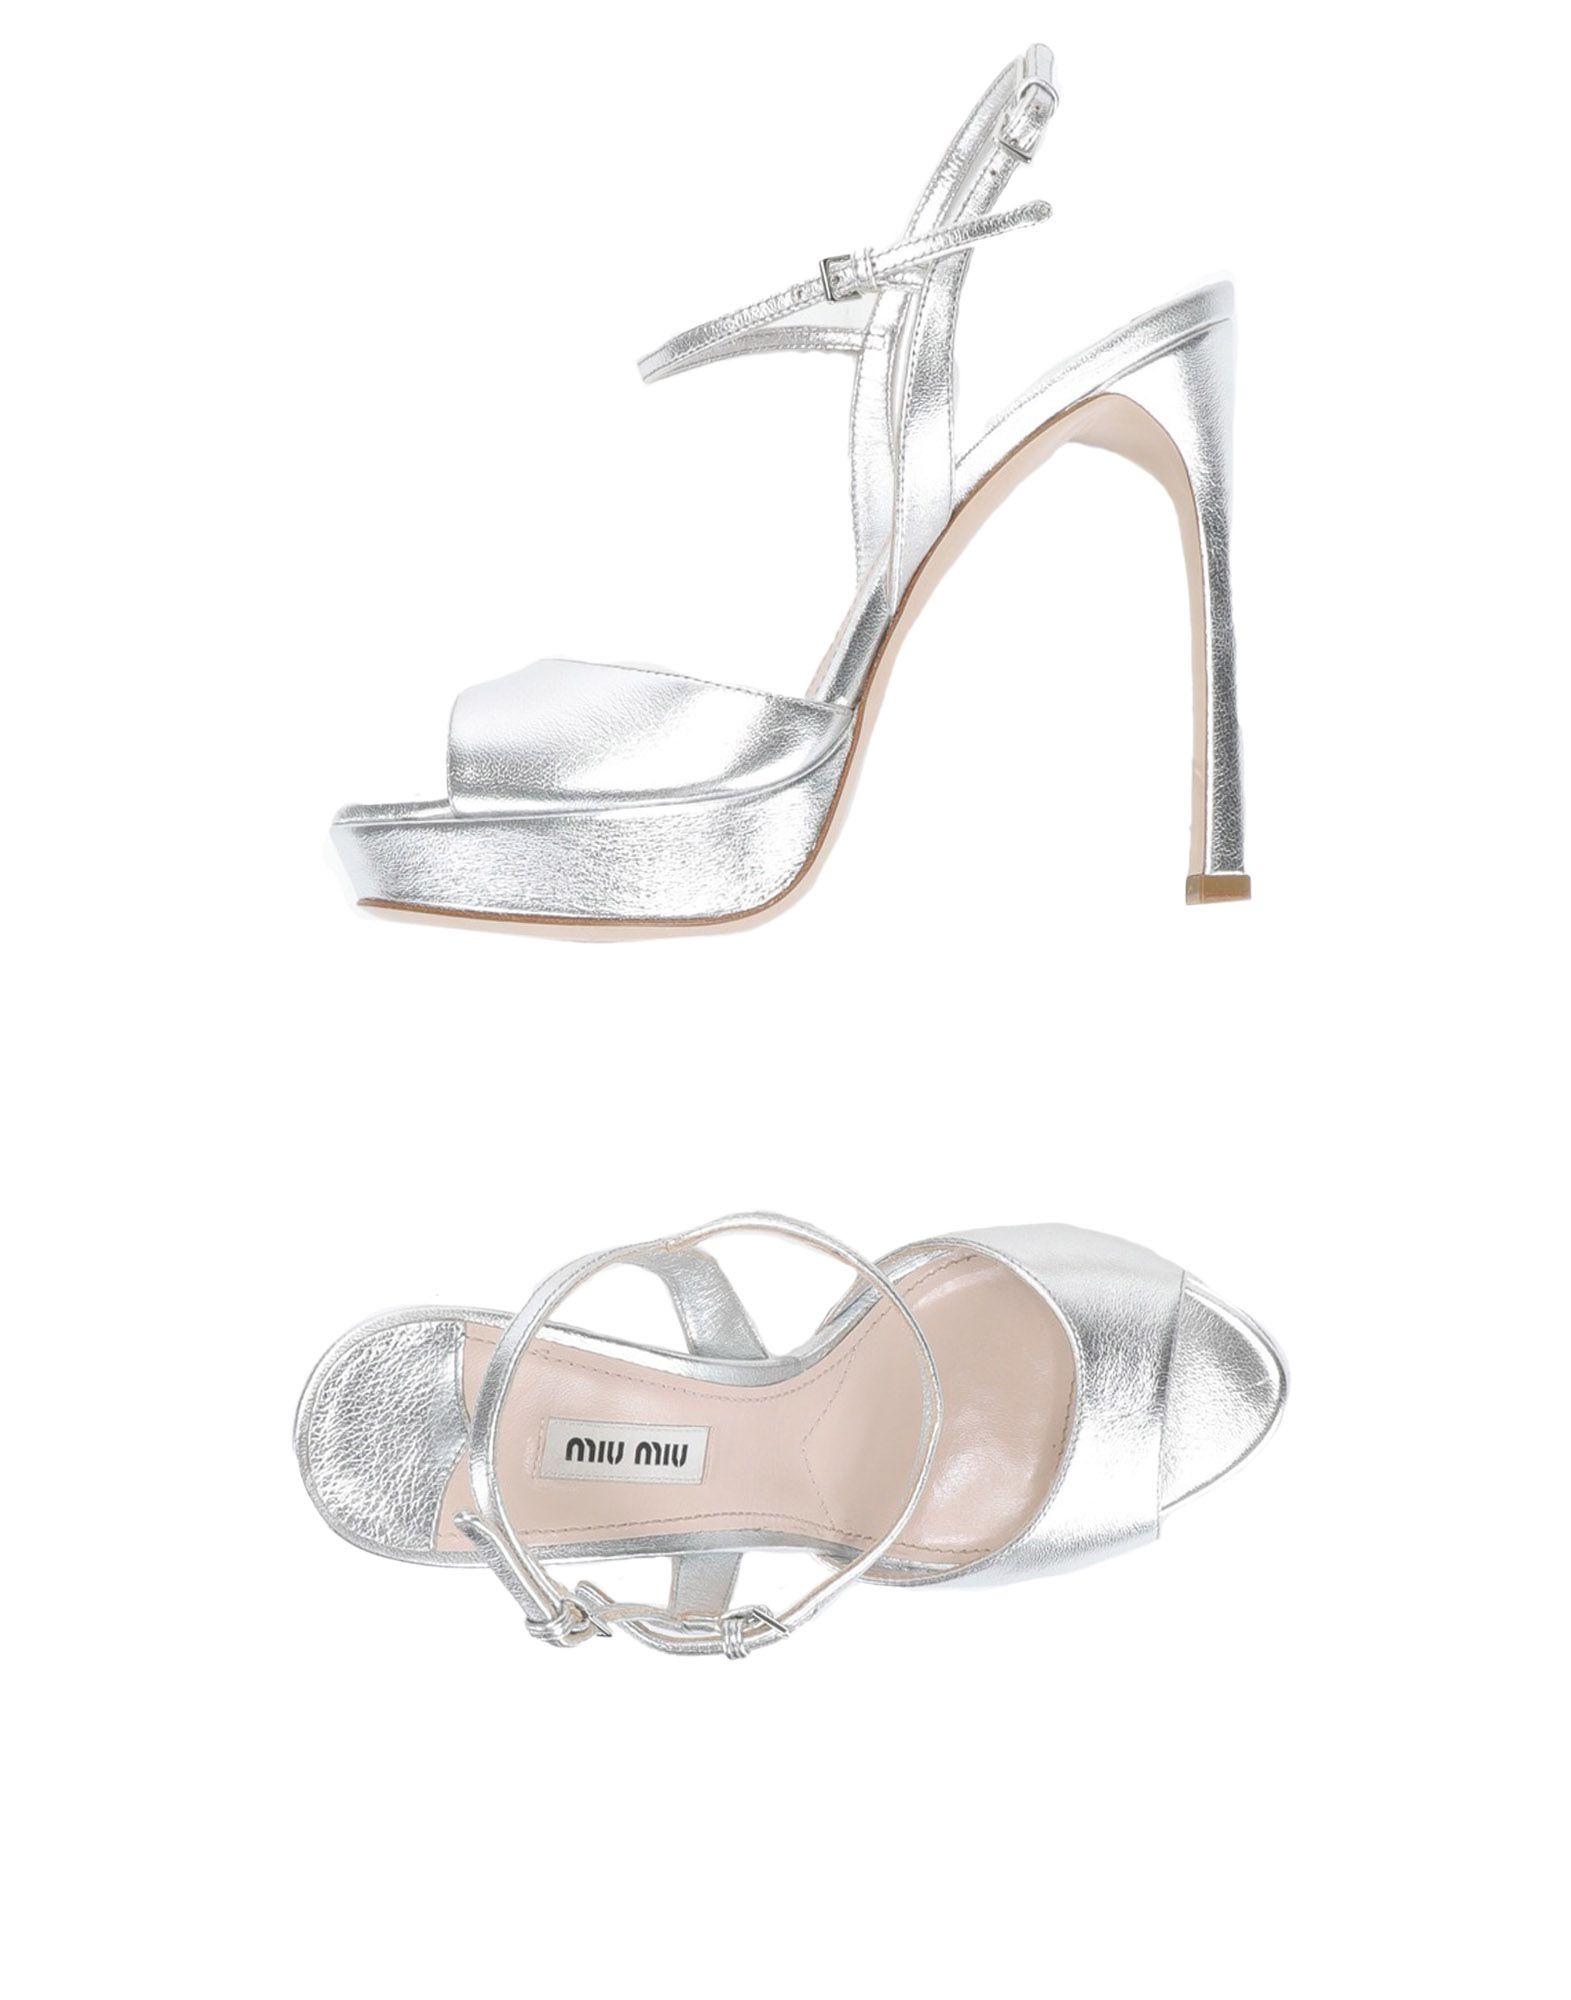 Miu Miu Sandals - Women on Miu Miu Sandals online on Women  Canada - 11522325VI 38caee